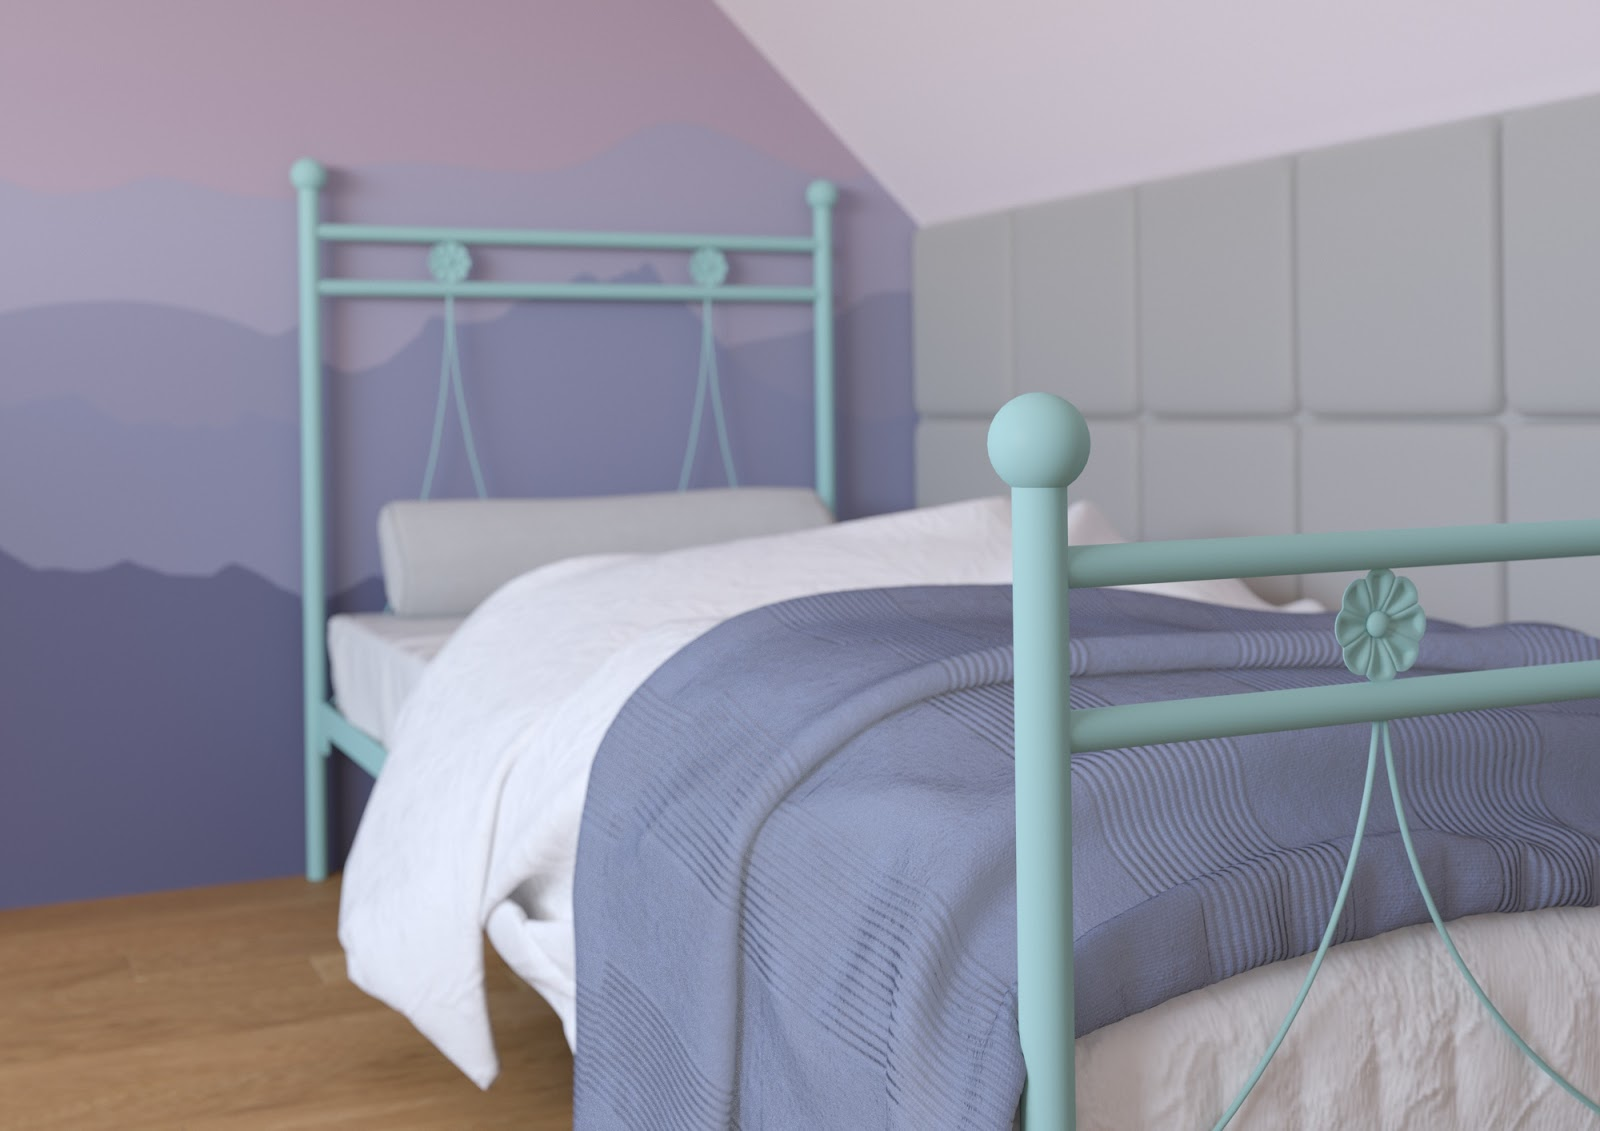 Łóżko metalowe wzór 37 (80-120 cm)